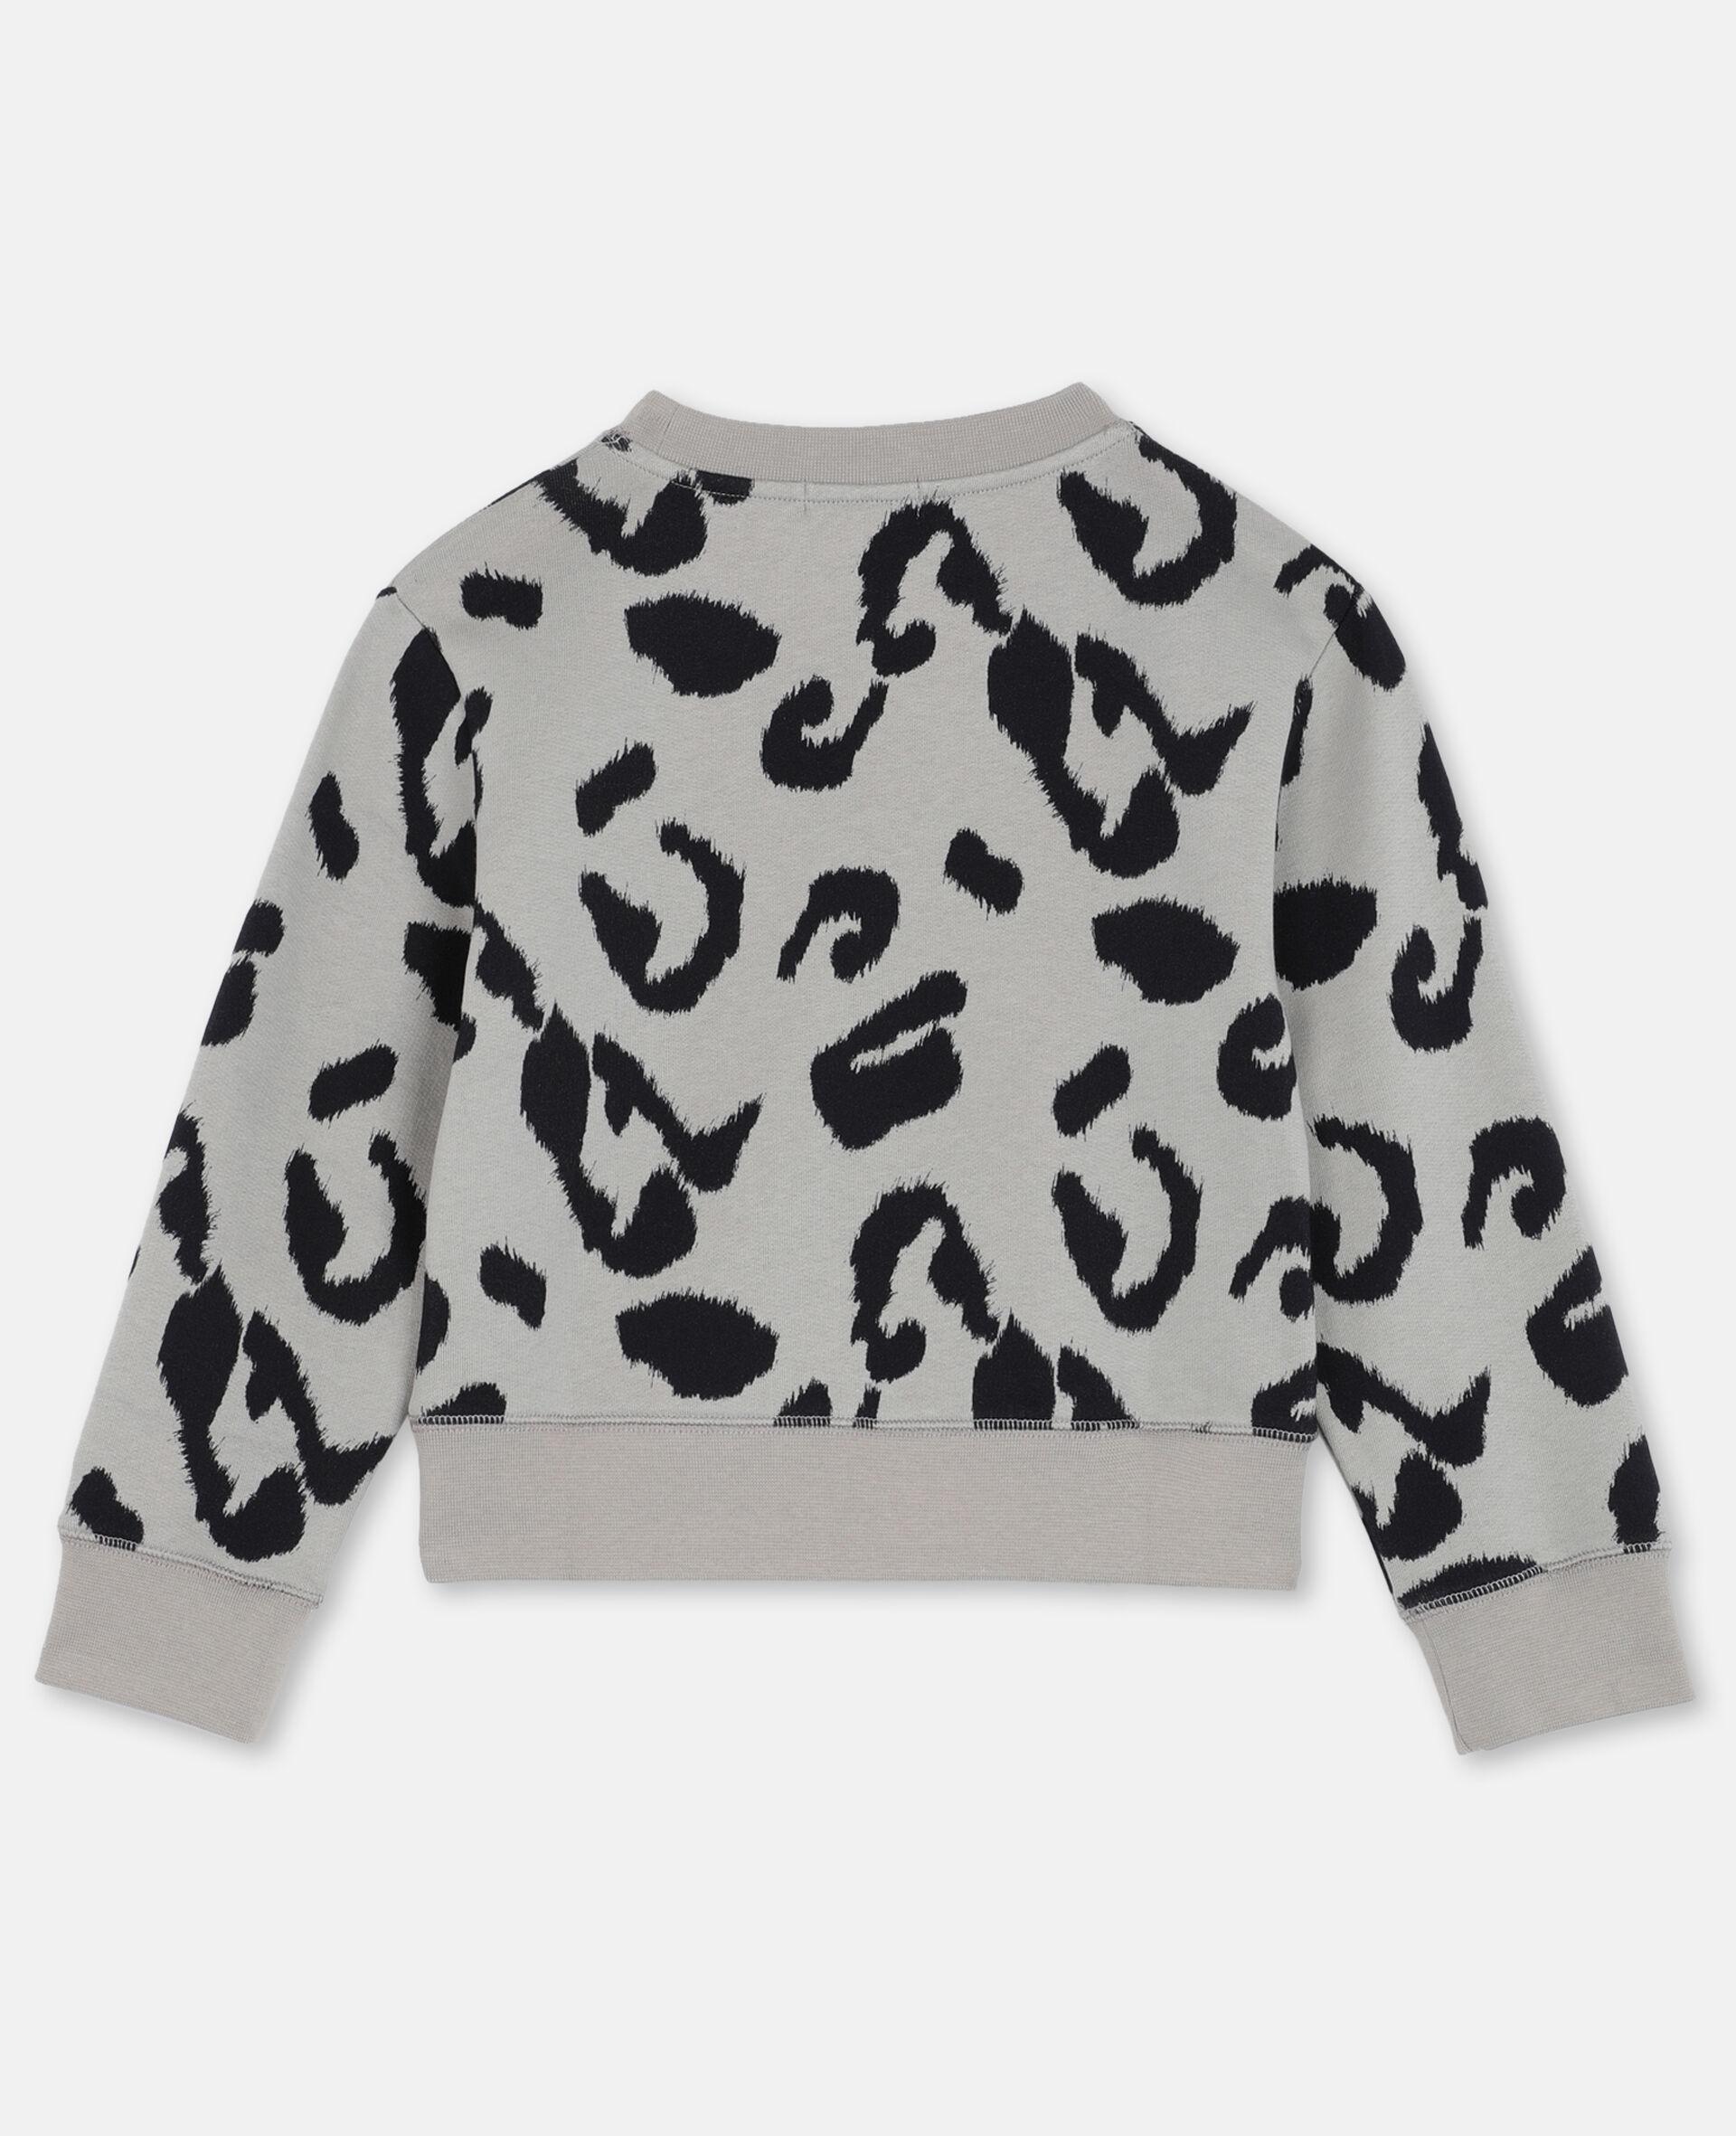 Leopard Cotton Fleece Sweatshirt -Multicoloured-large image number 3